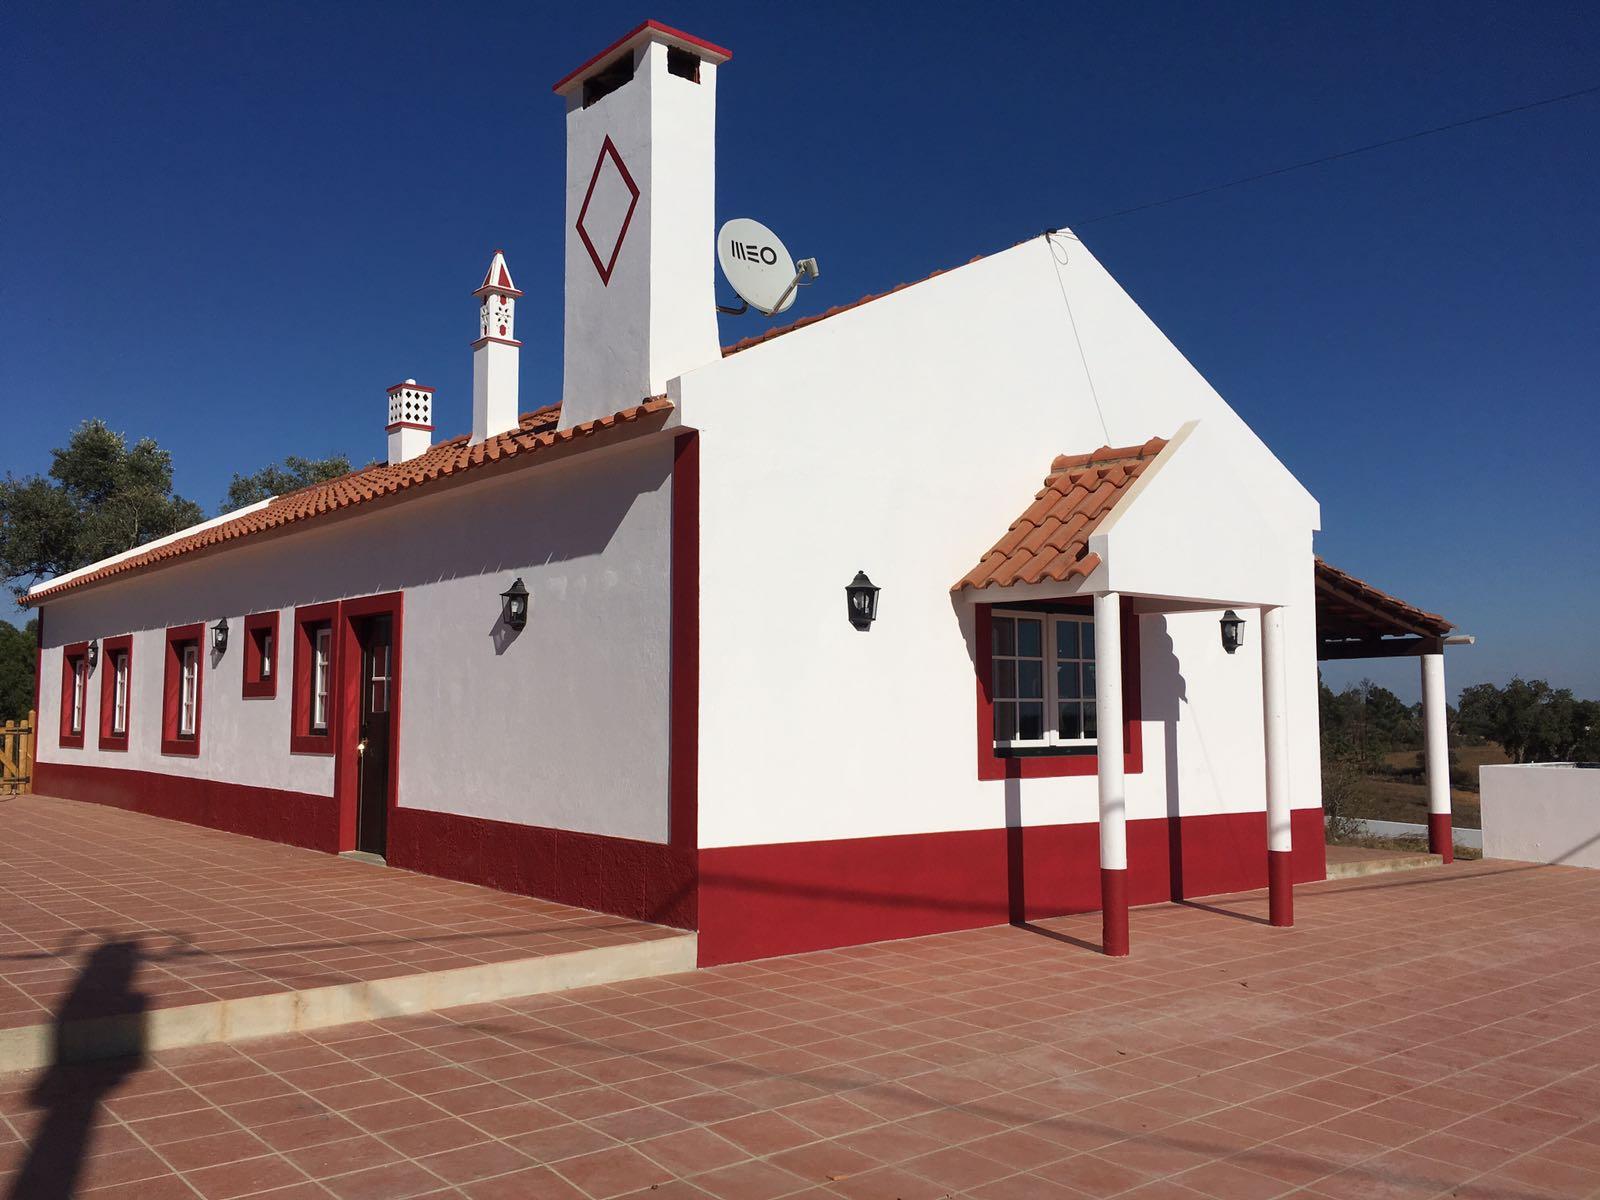 5-BEDROOM COUTRY HOUSE NEAR THE BEACH IN SANTIAGO DO CACÉM